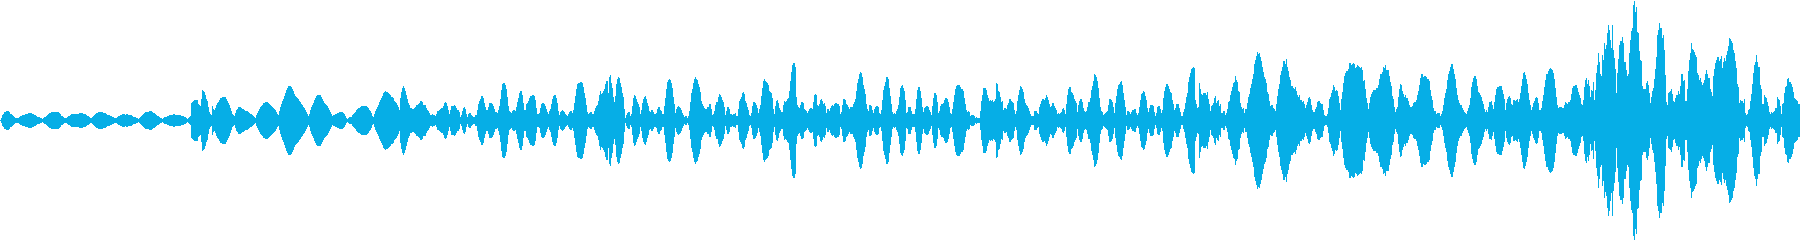 VORTEXスワイプの再生済みの波形